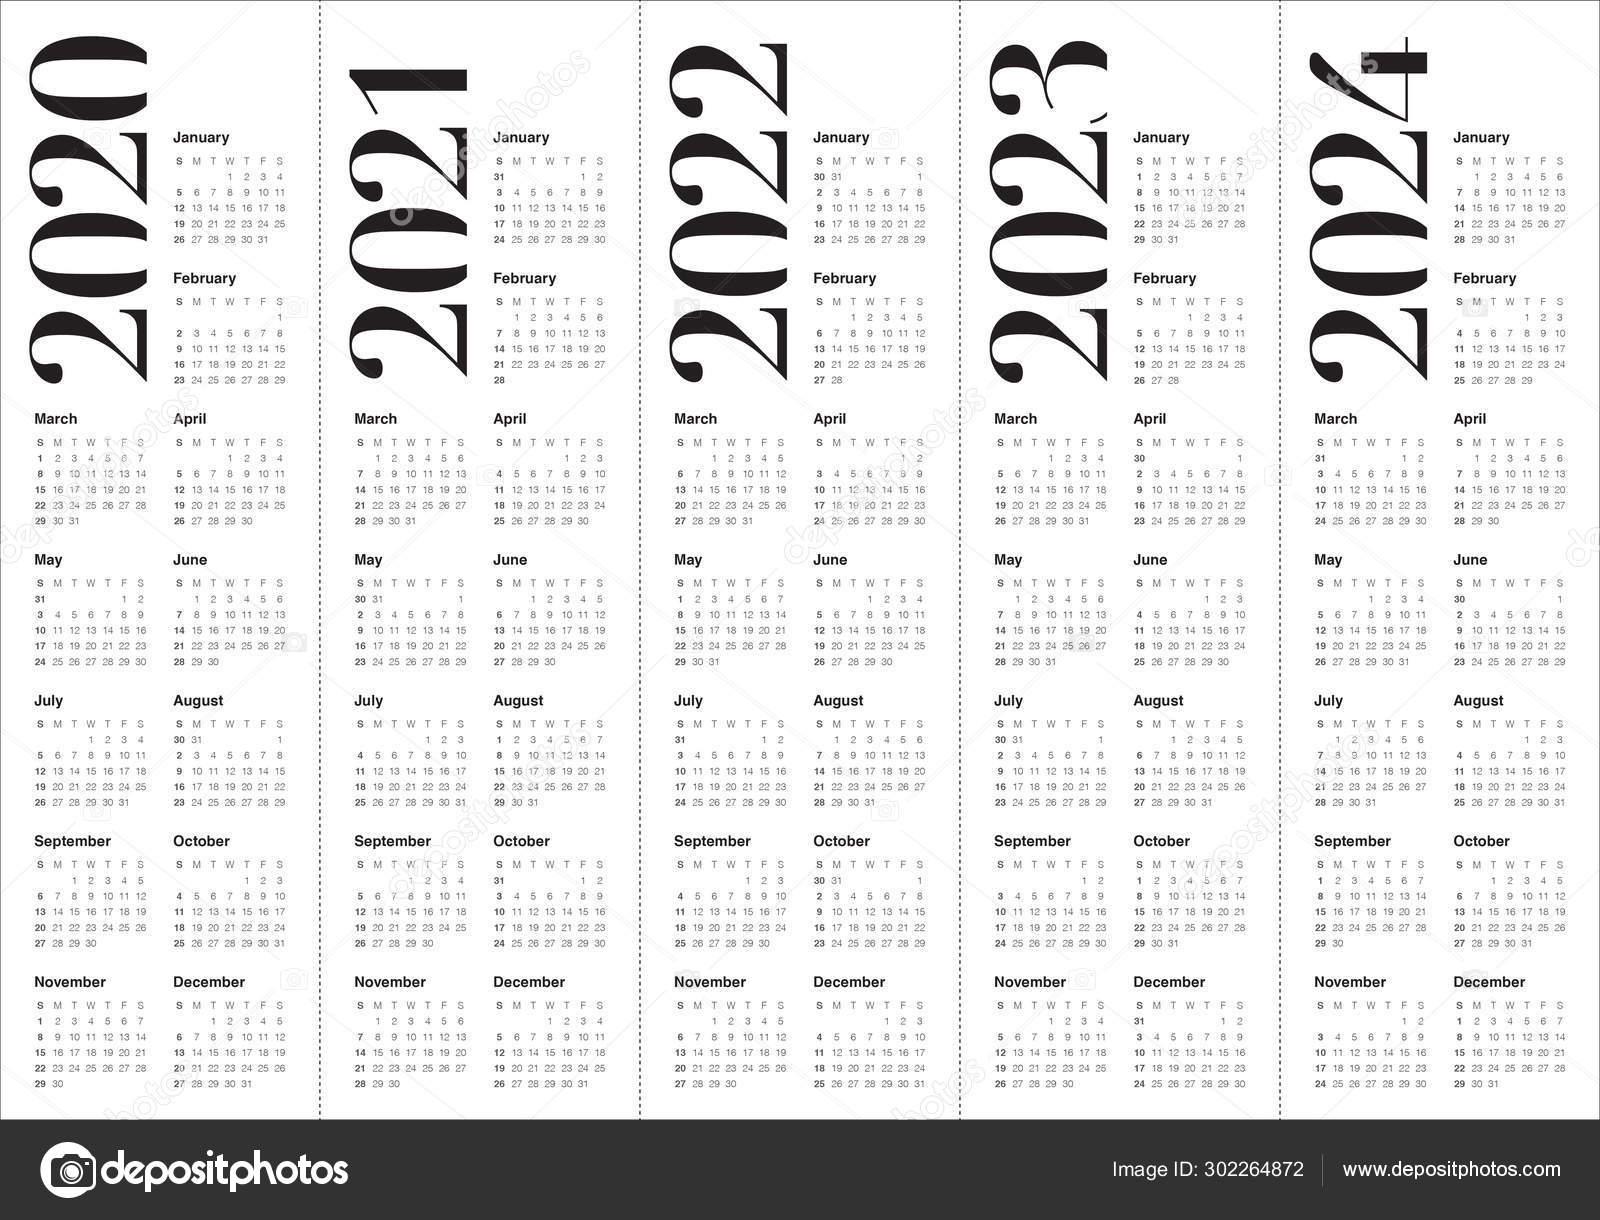 Catch Printable Calendars 2021 2022 2023 2024